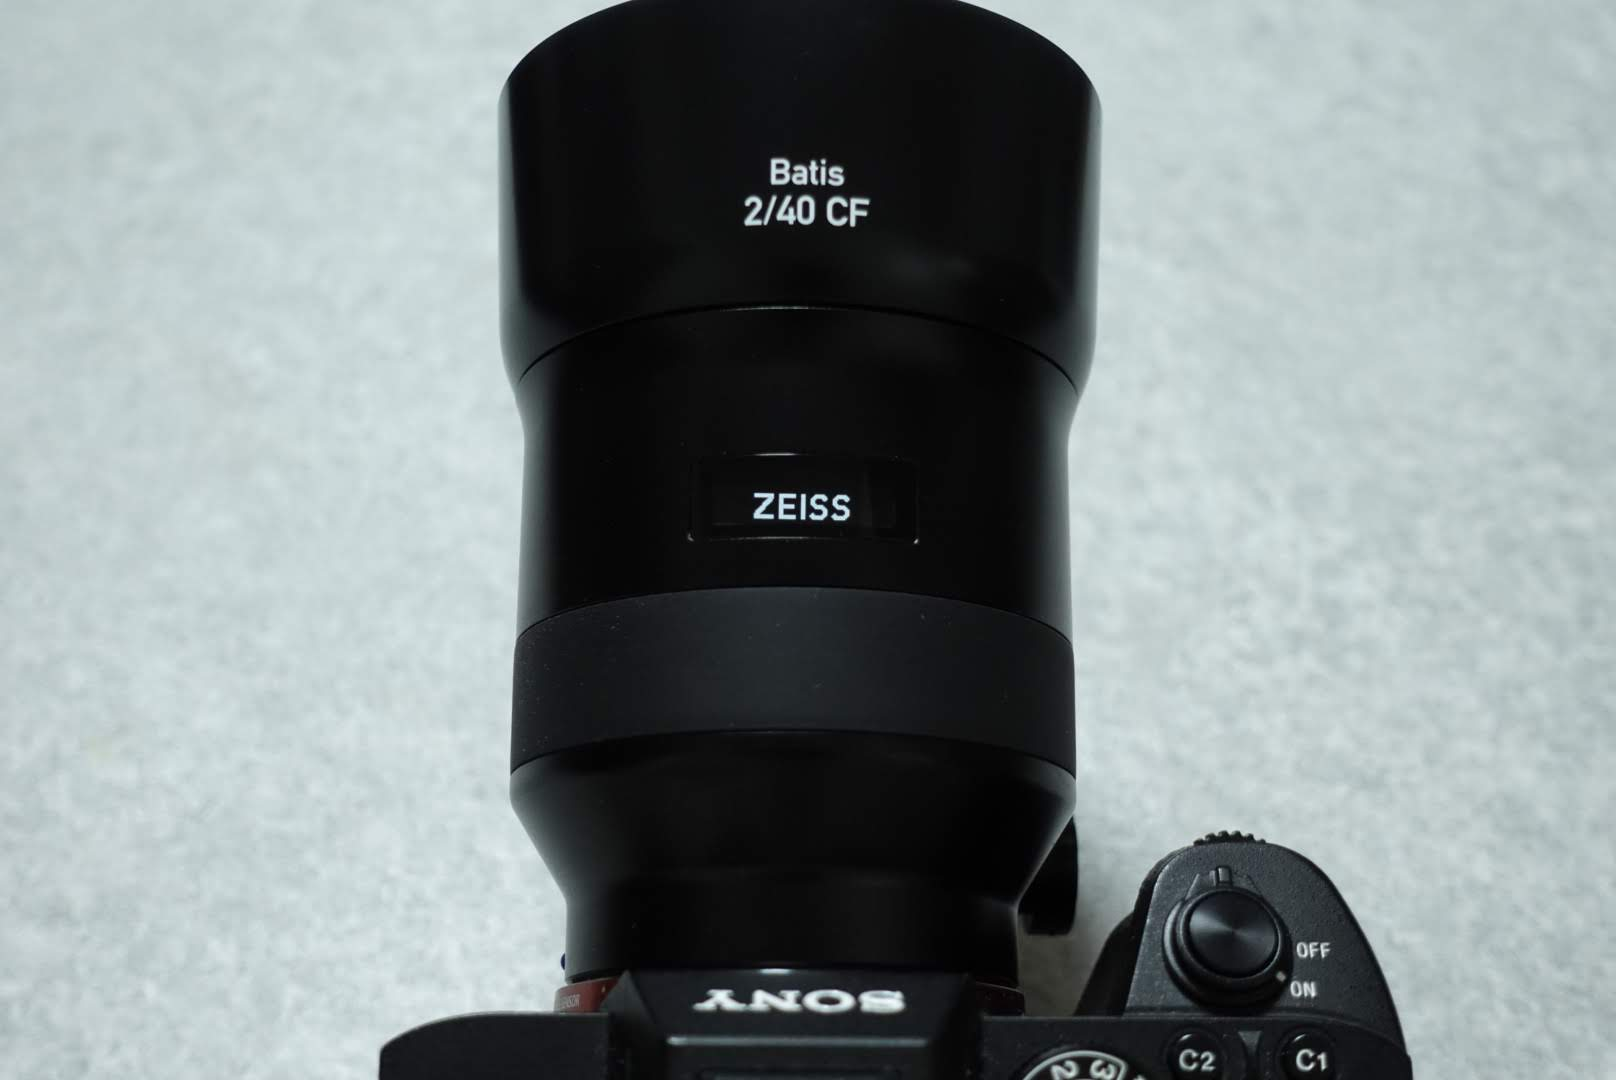 【SONY】Camera Technique Vol.13 CarlZeiss Batisシリーズの距離計